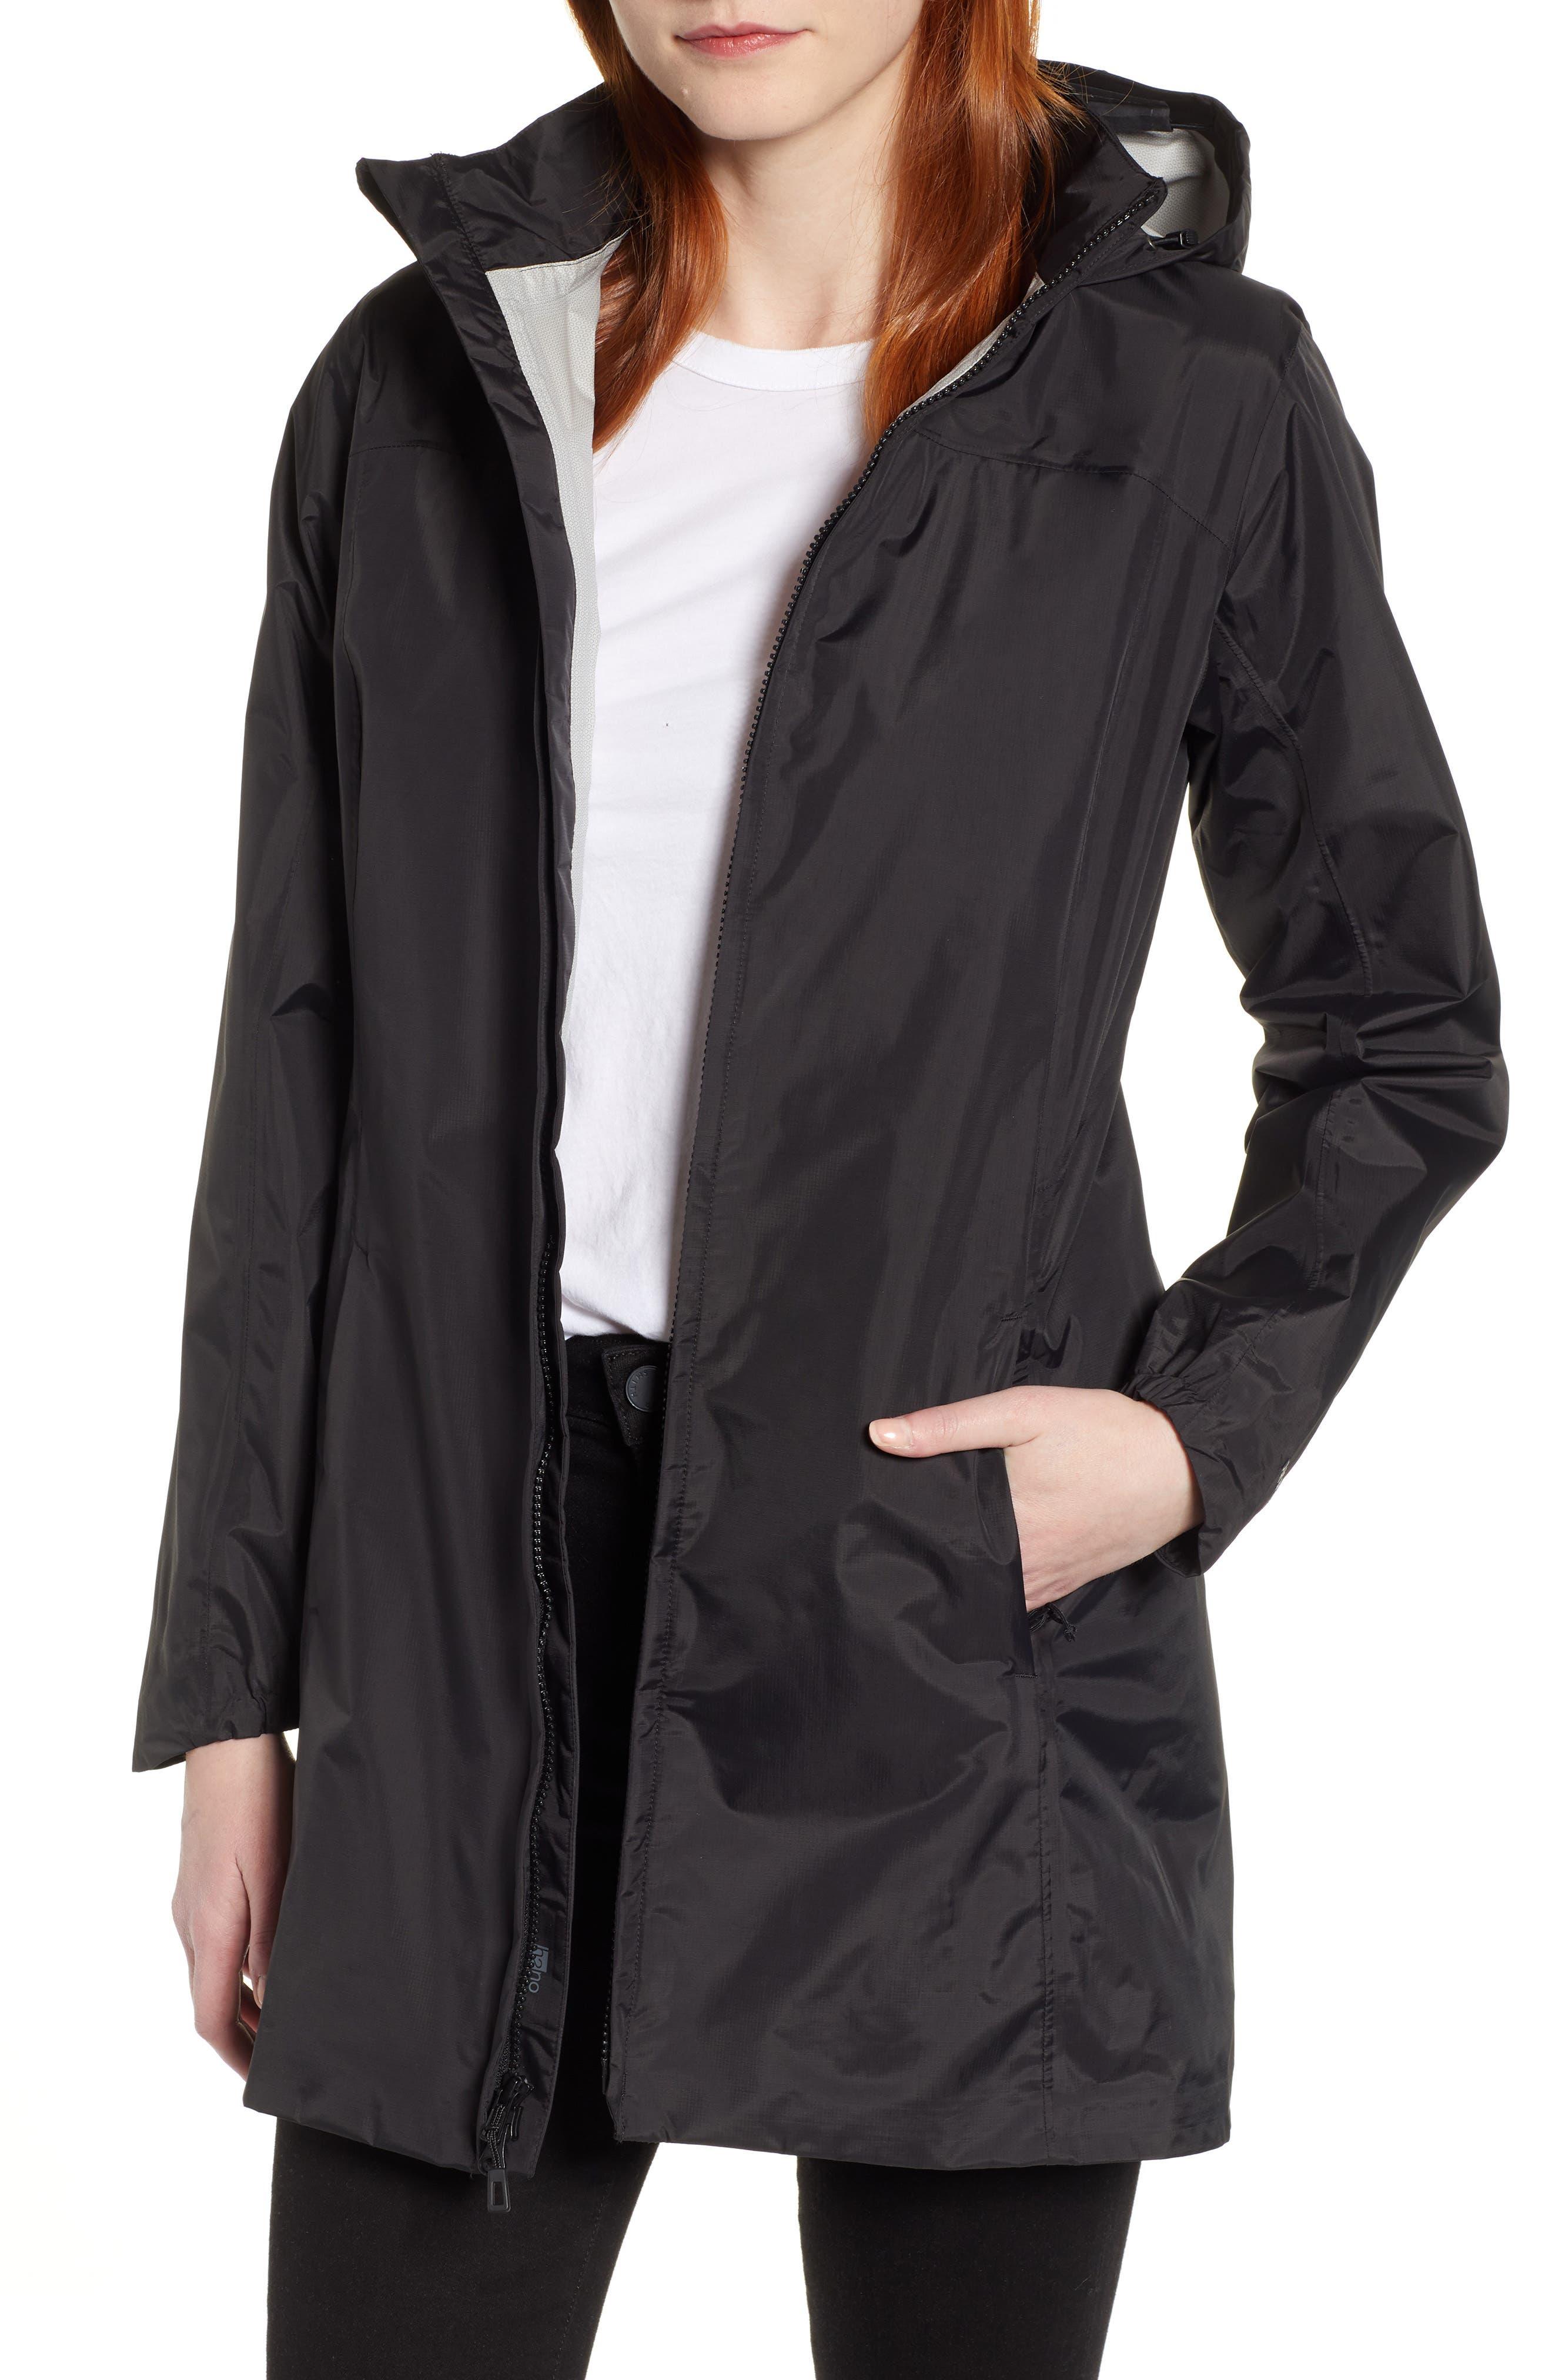 Patagonia Torrentshell Waterproof City Rain Coat